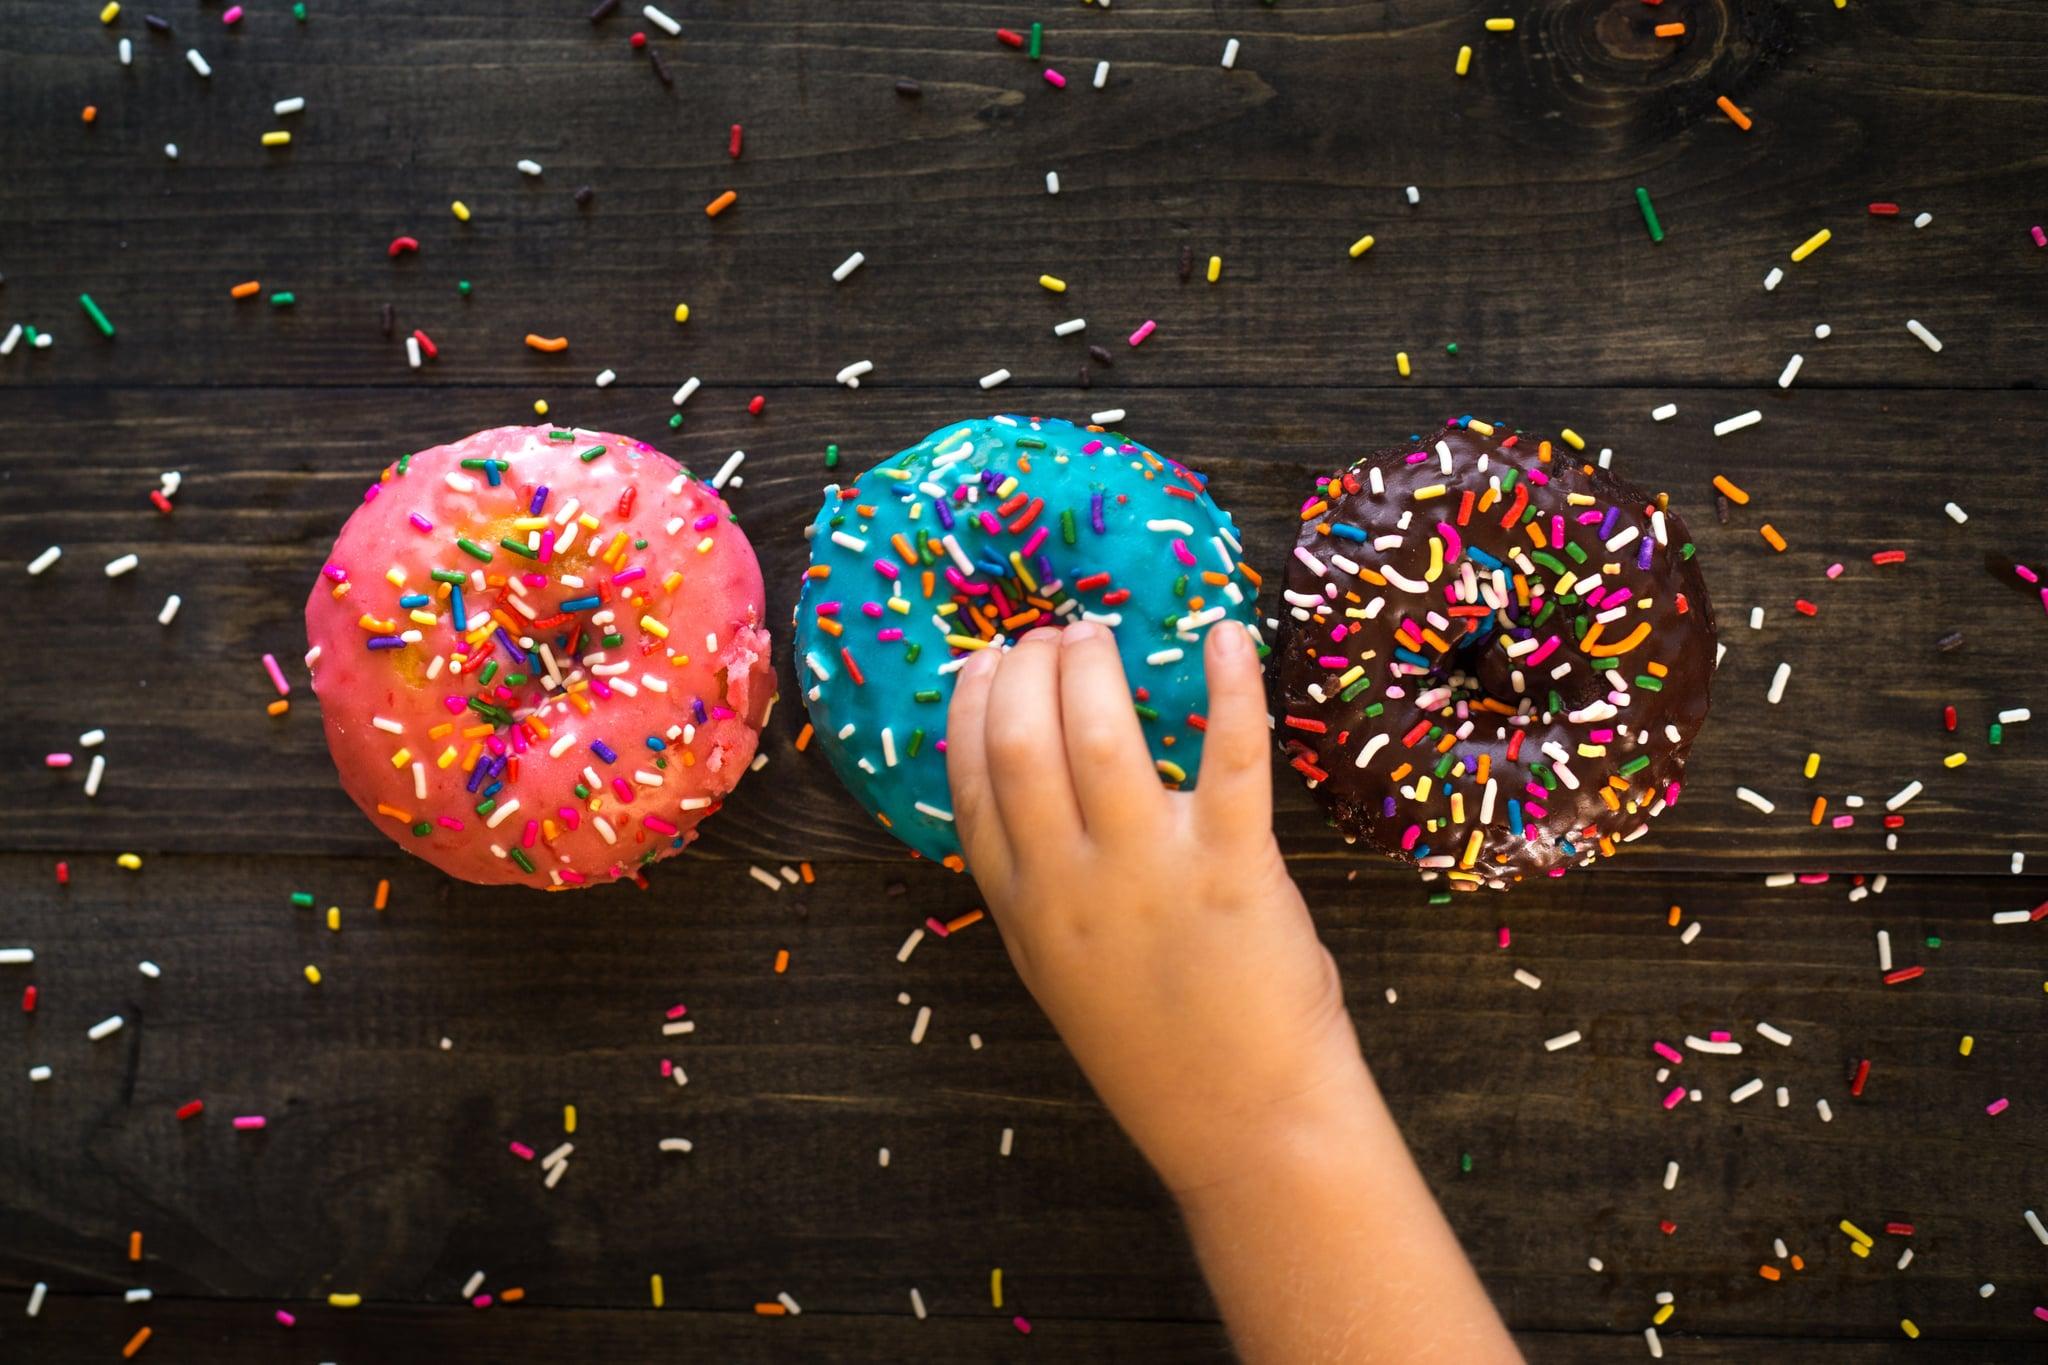 5 Ways to Reward Kids For Good Behavior That Don't Involve Food